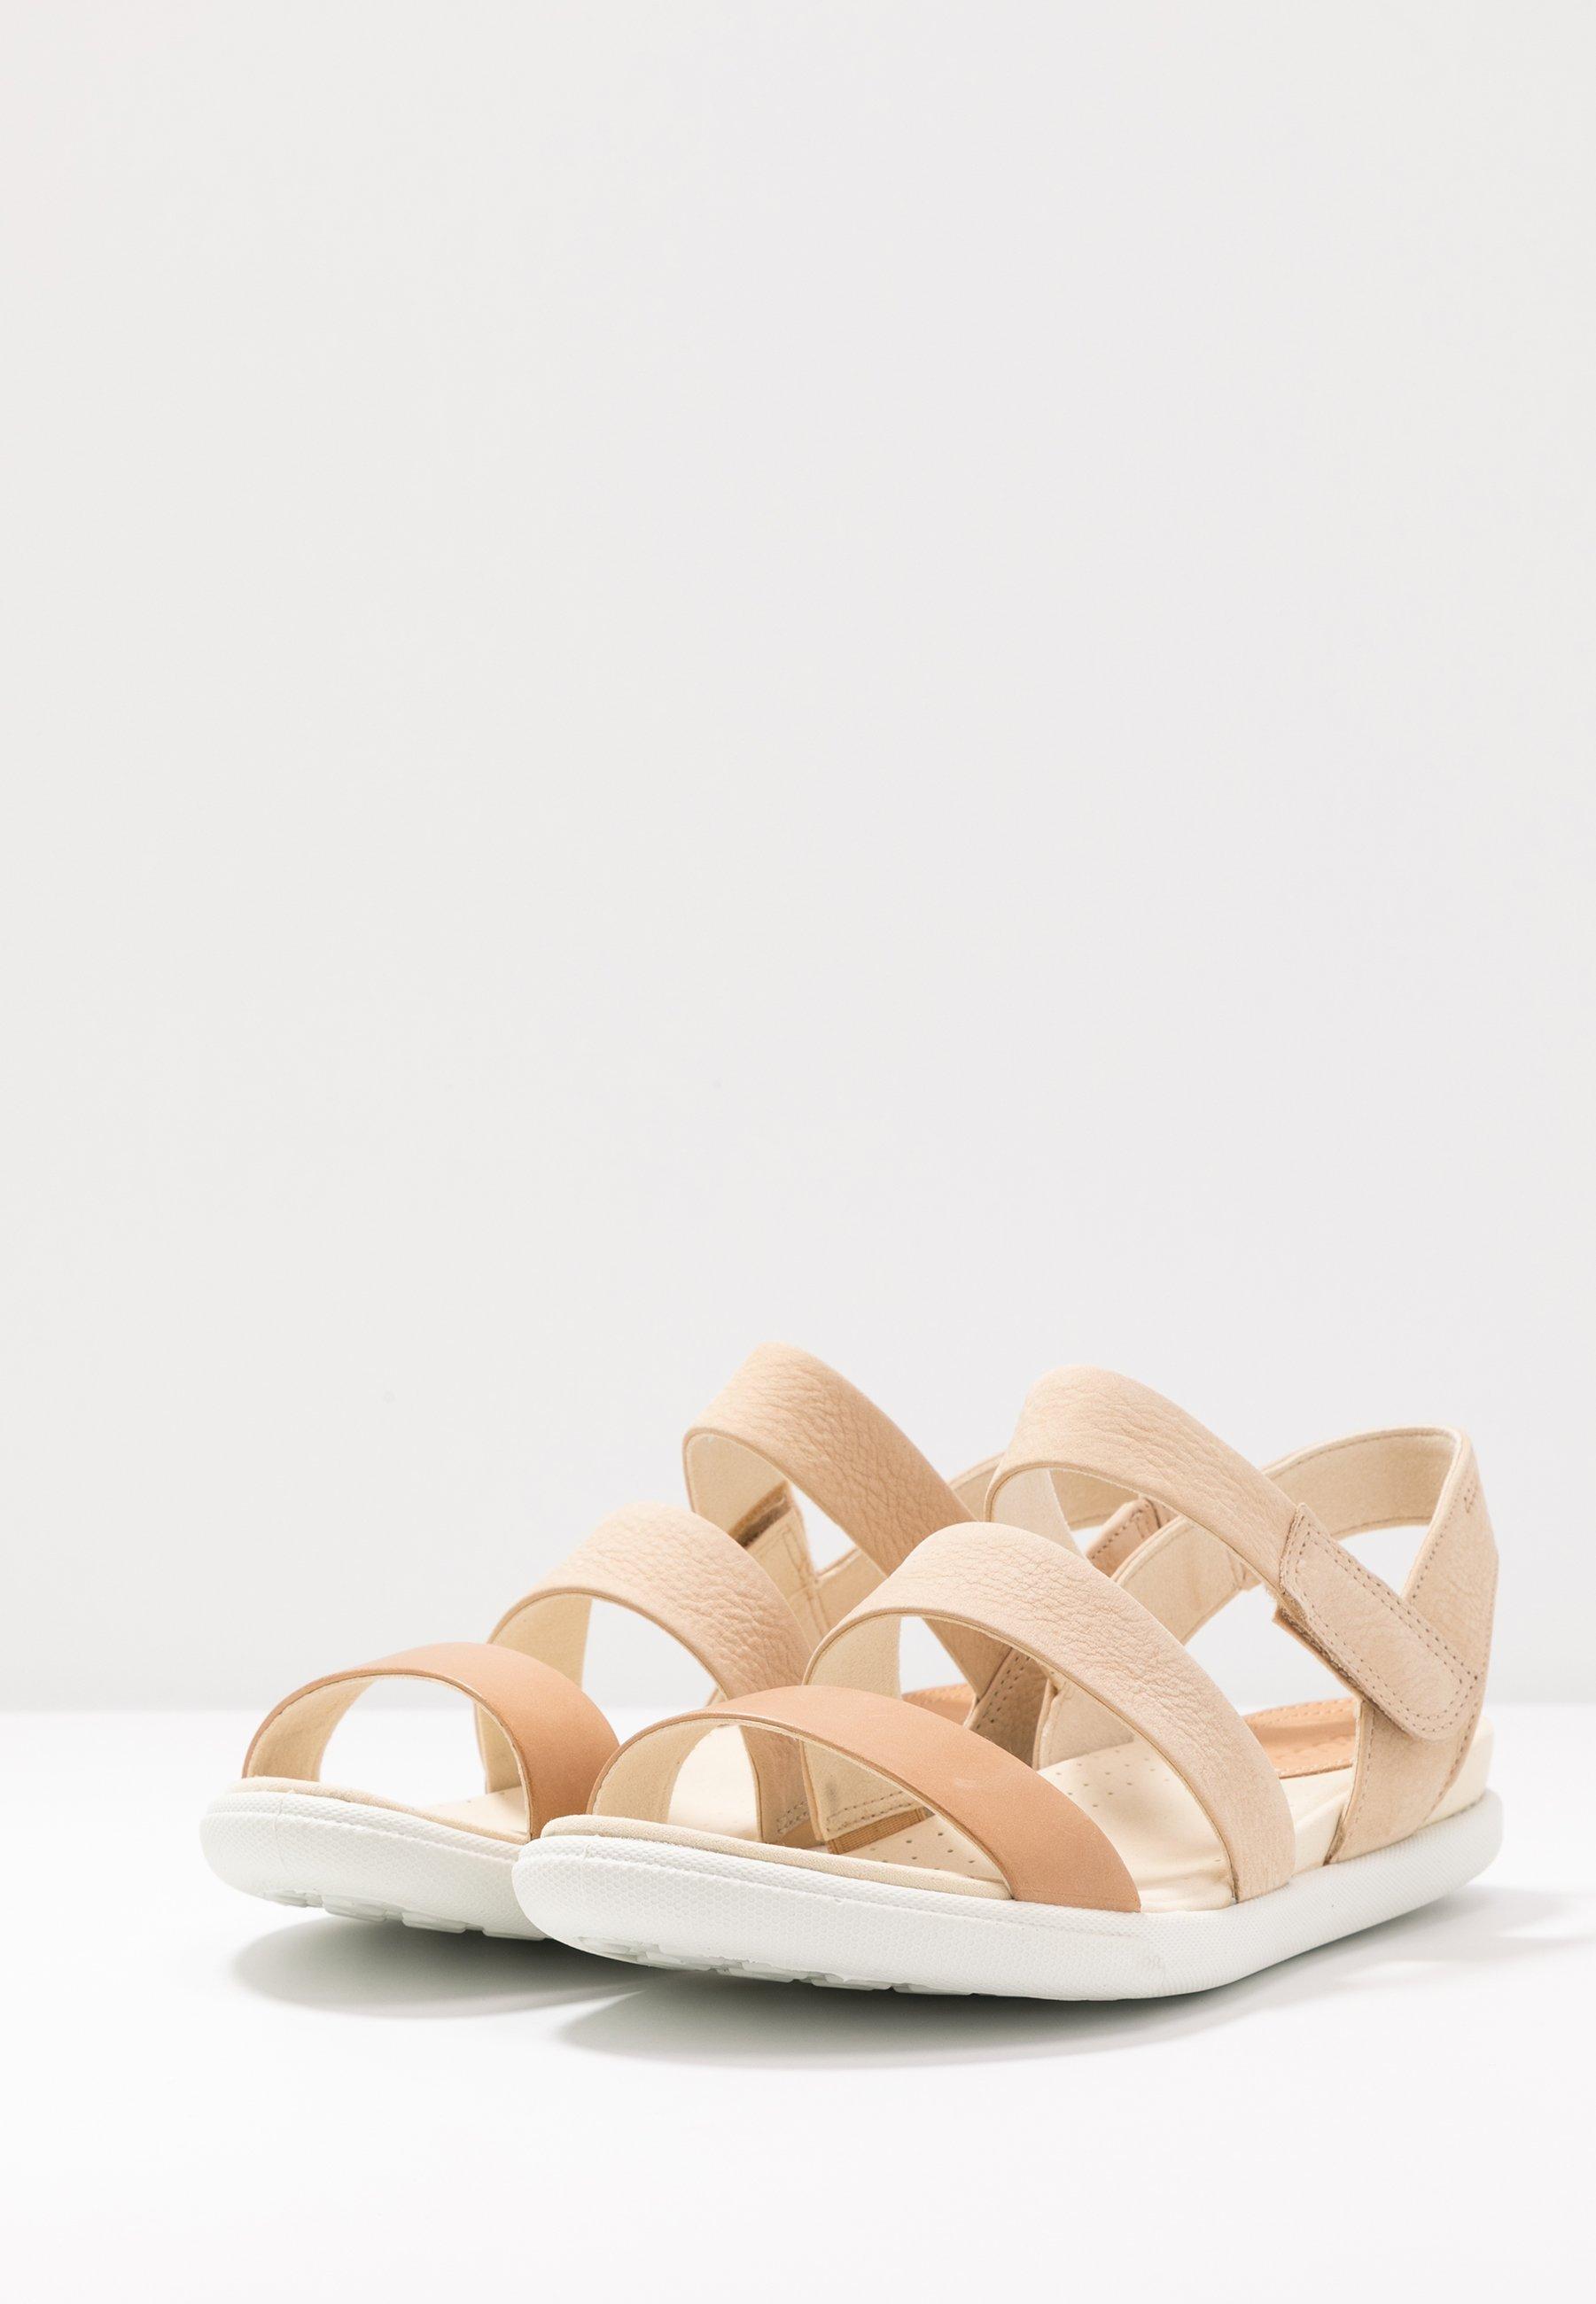 Relaxed Women Sandals Shoes Ecco Damara Beige Sandals Beige